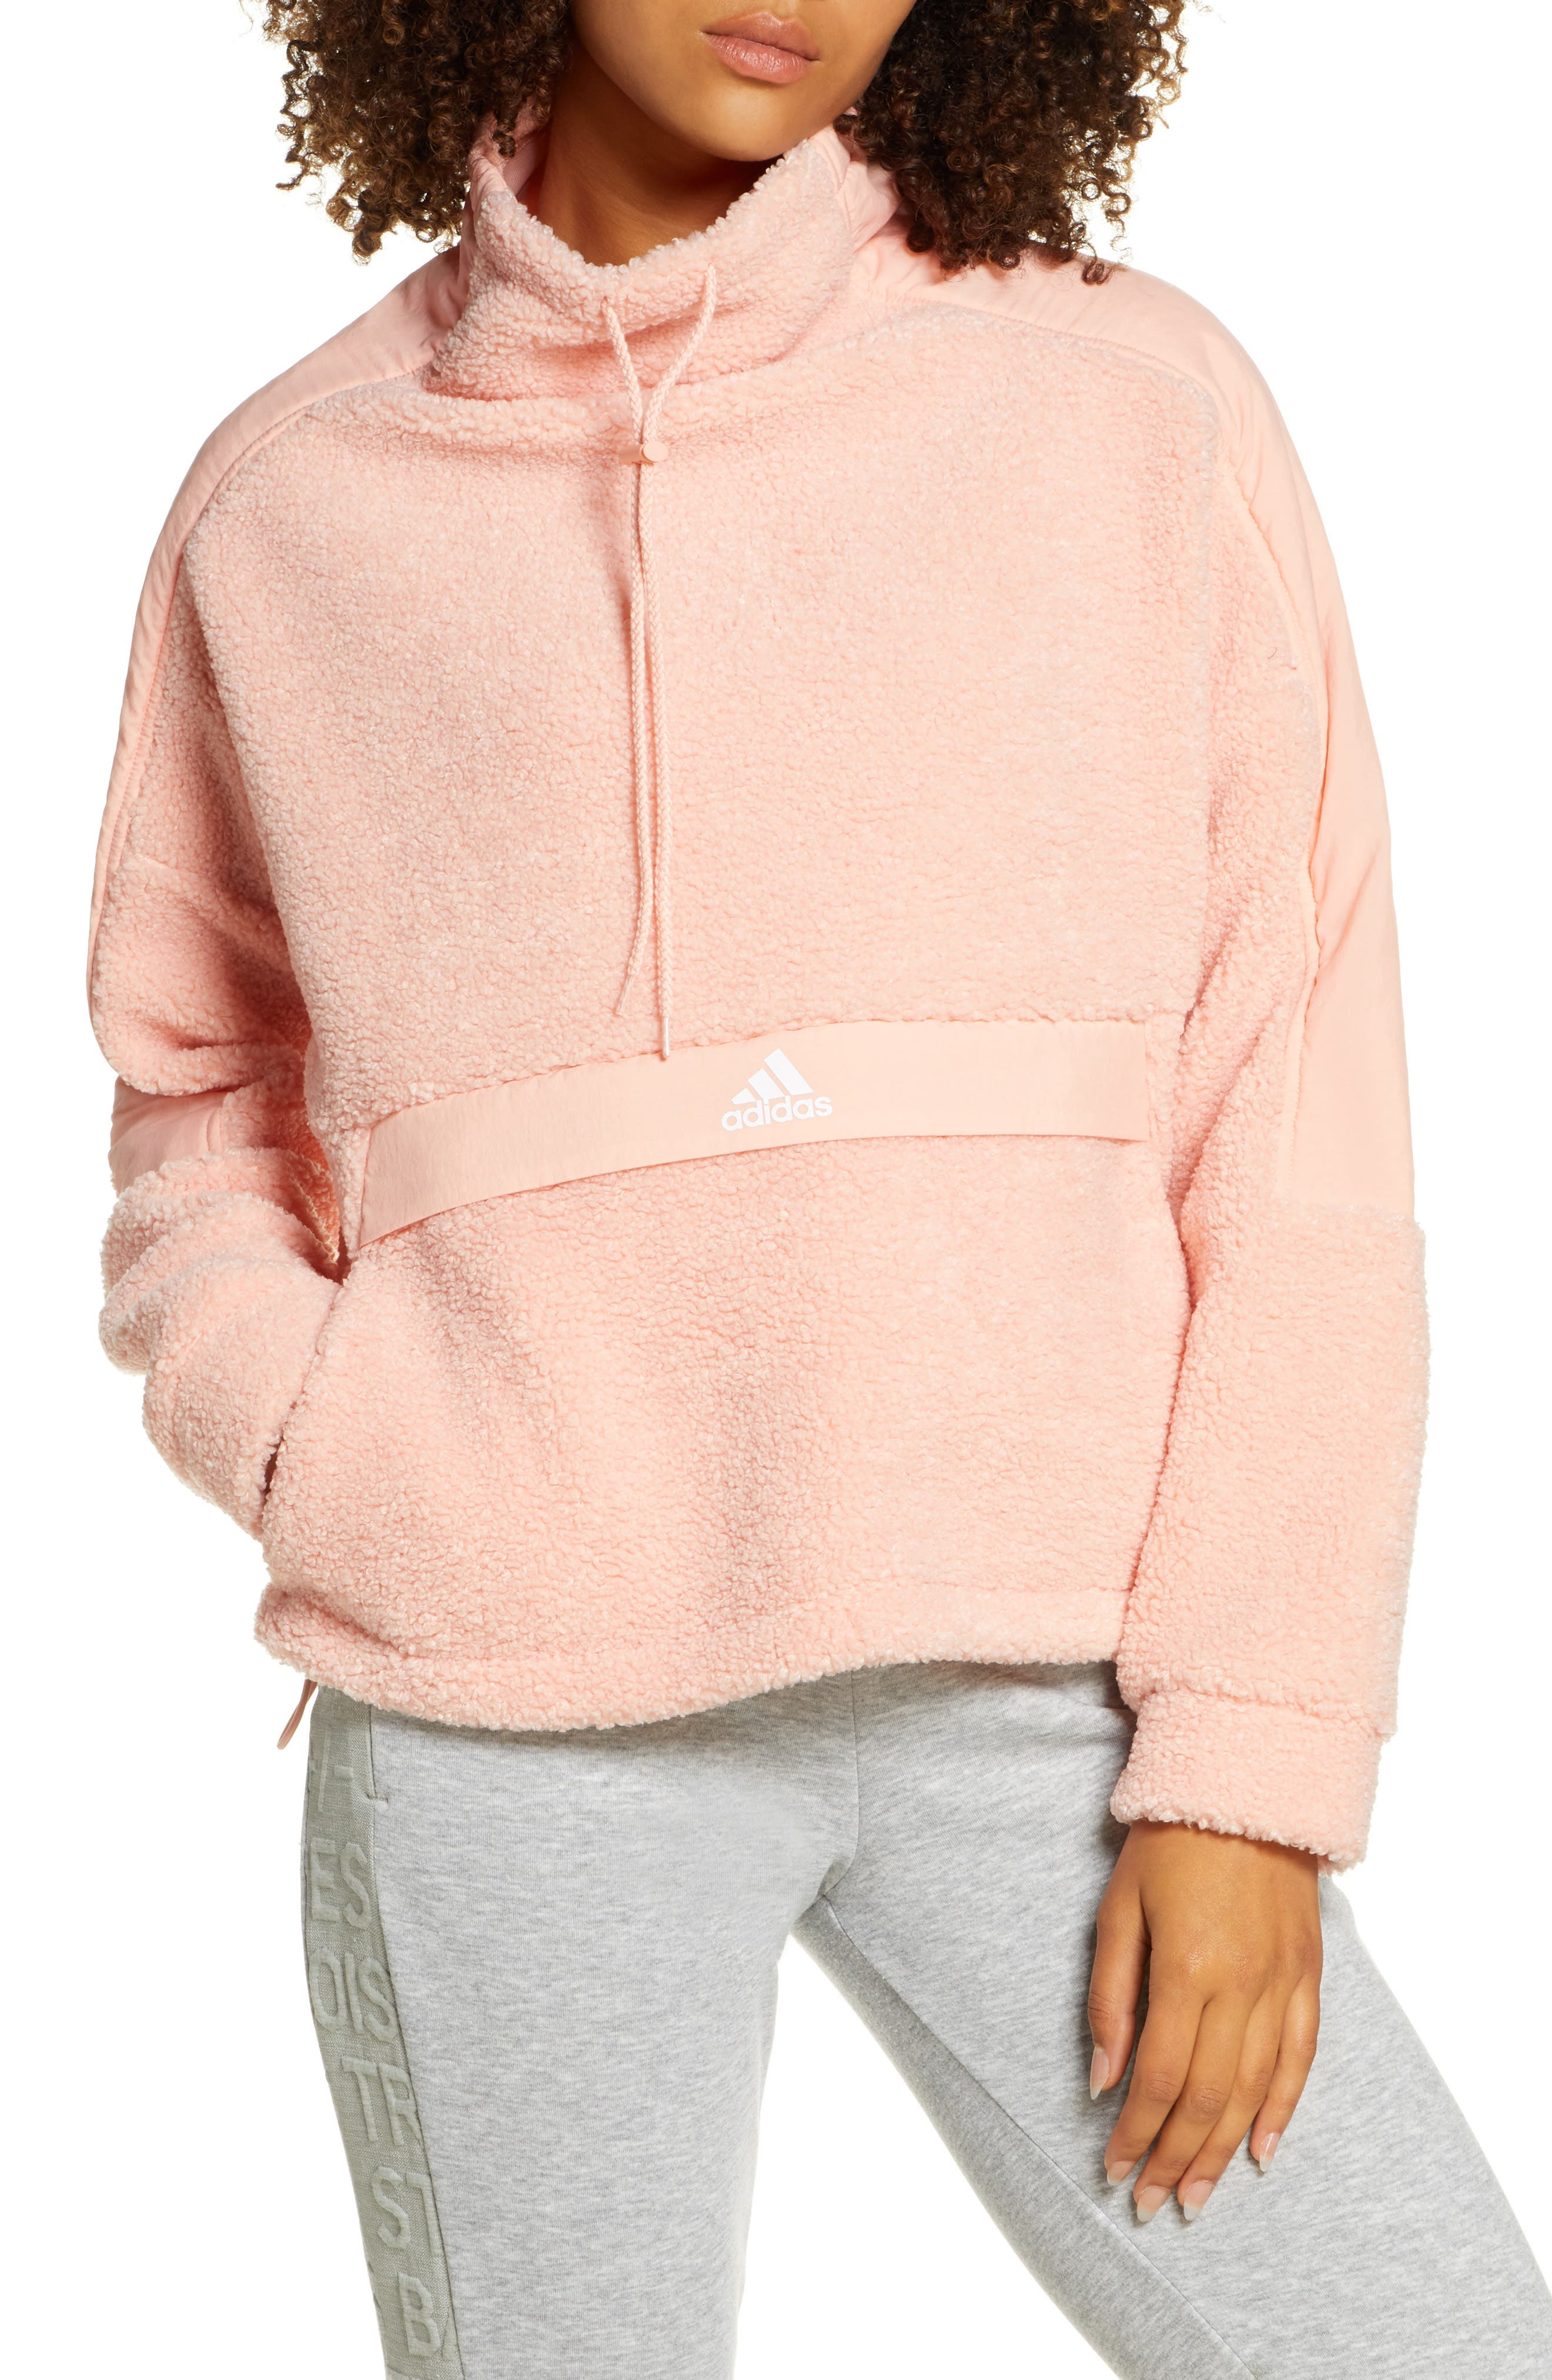 Adidas Womens 10 M L Pink Hoodie Sport Jacket Tracksuit